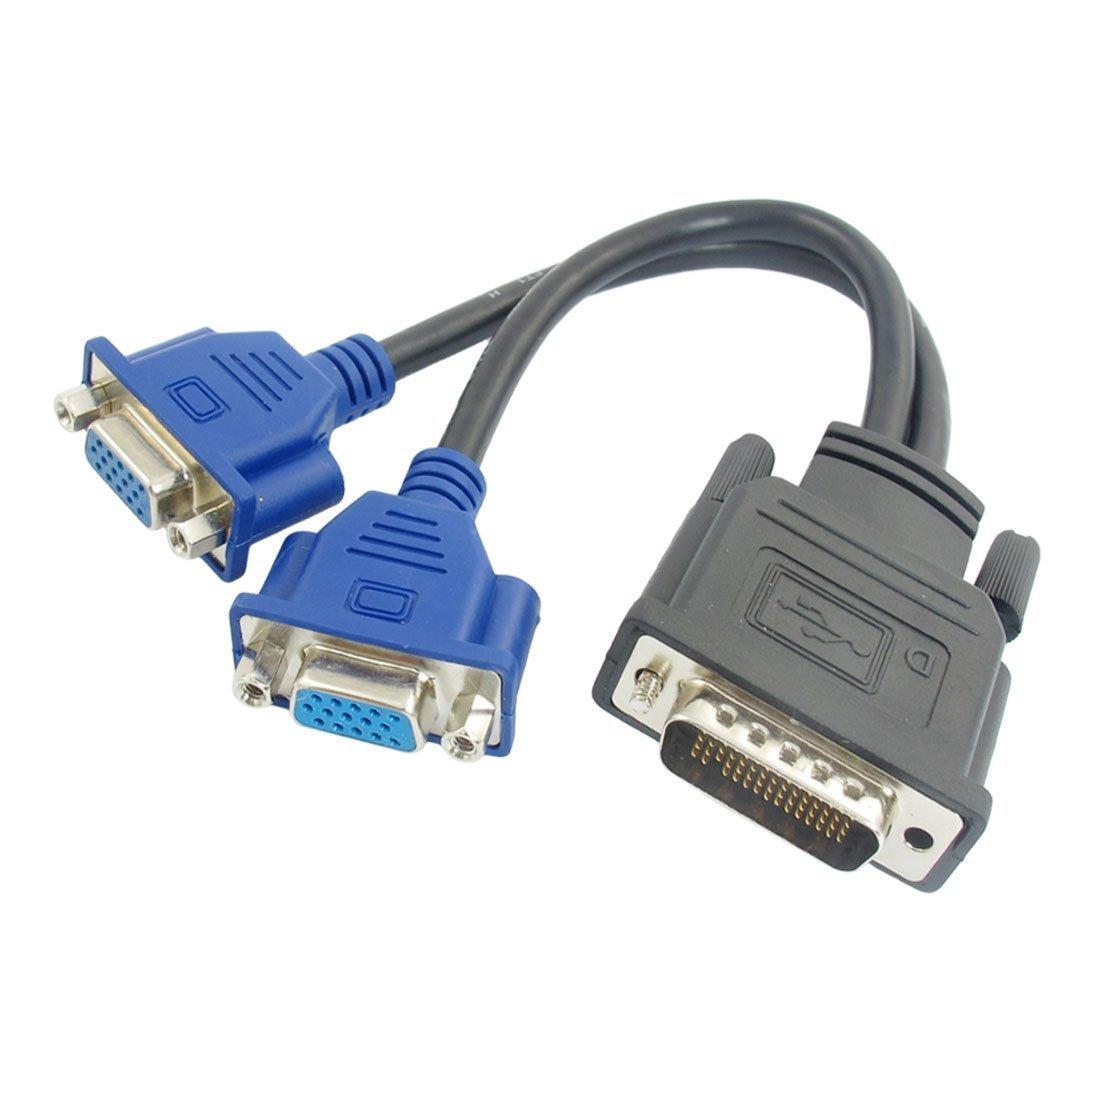 Amazon.com: Agile-Shop DMS-59 Pin Male to Dual VGA Female Y Splitter ...